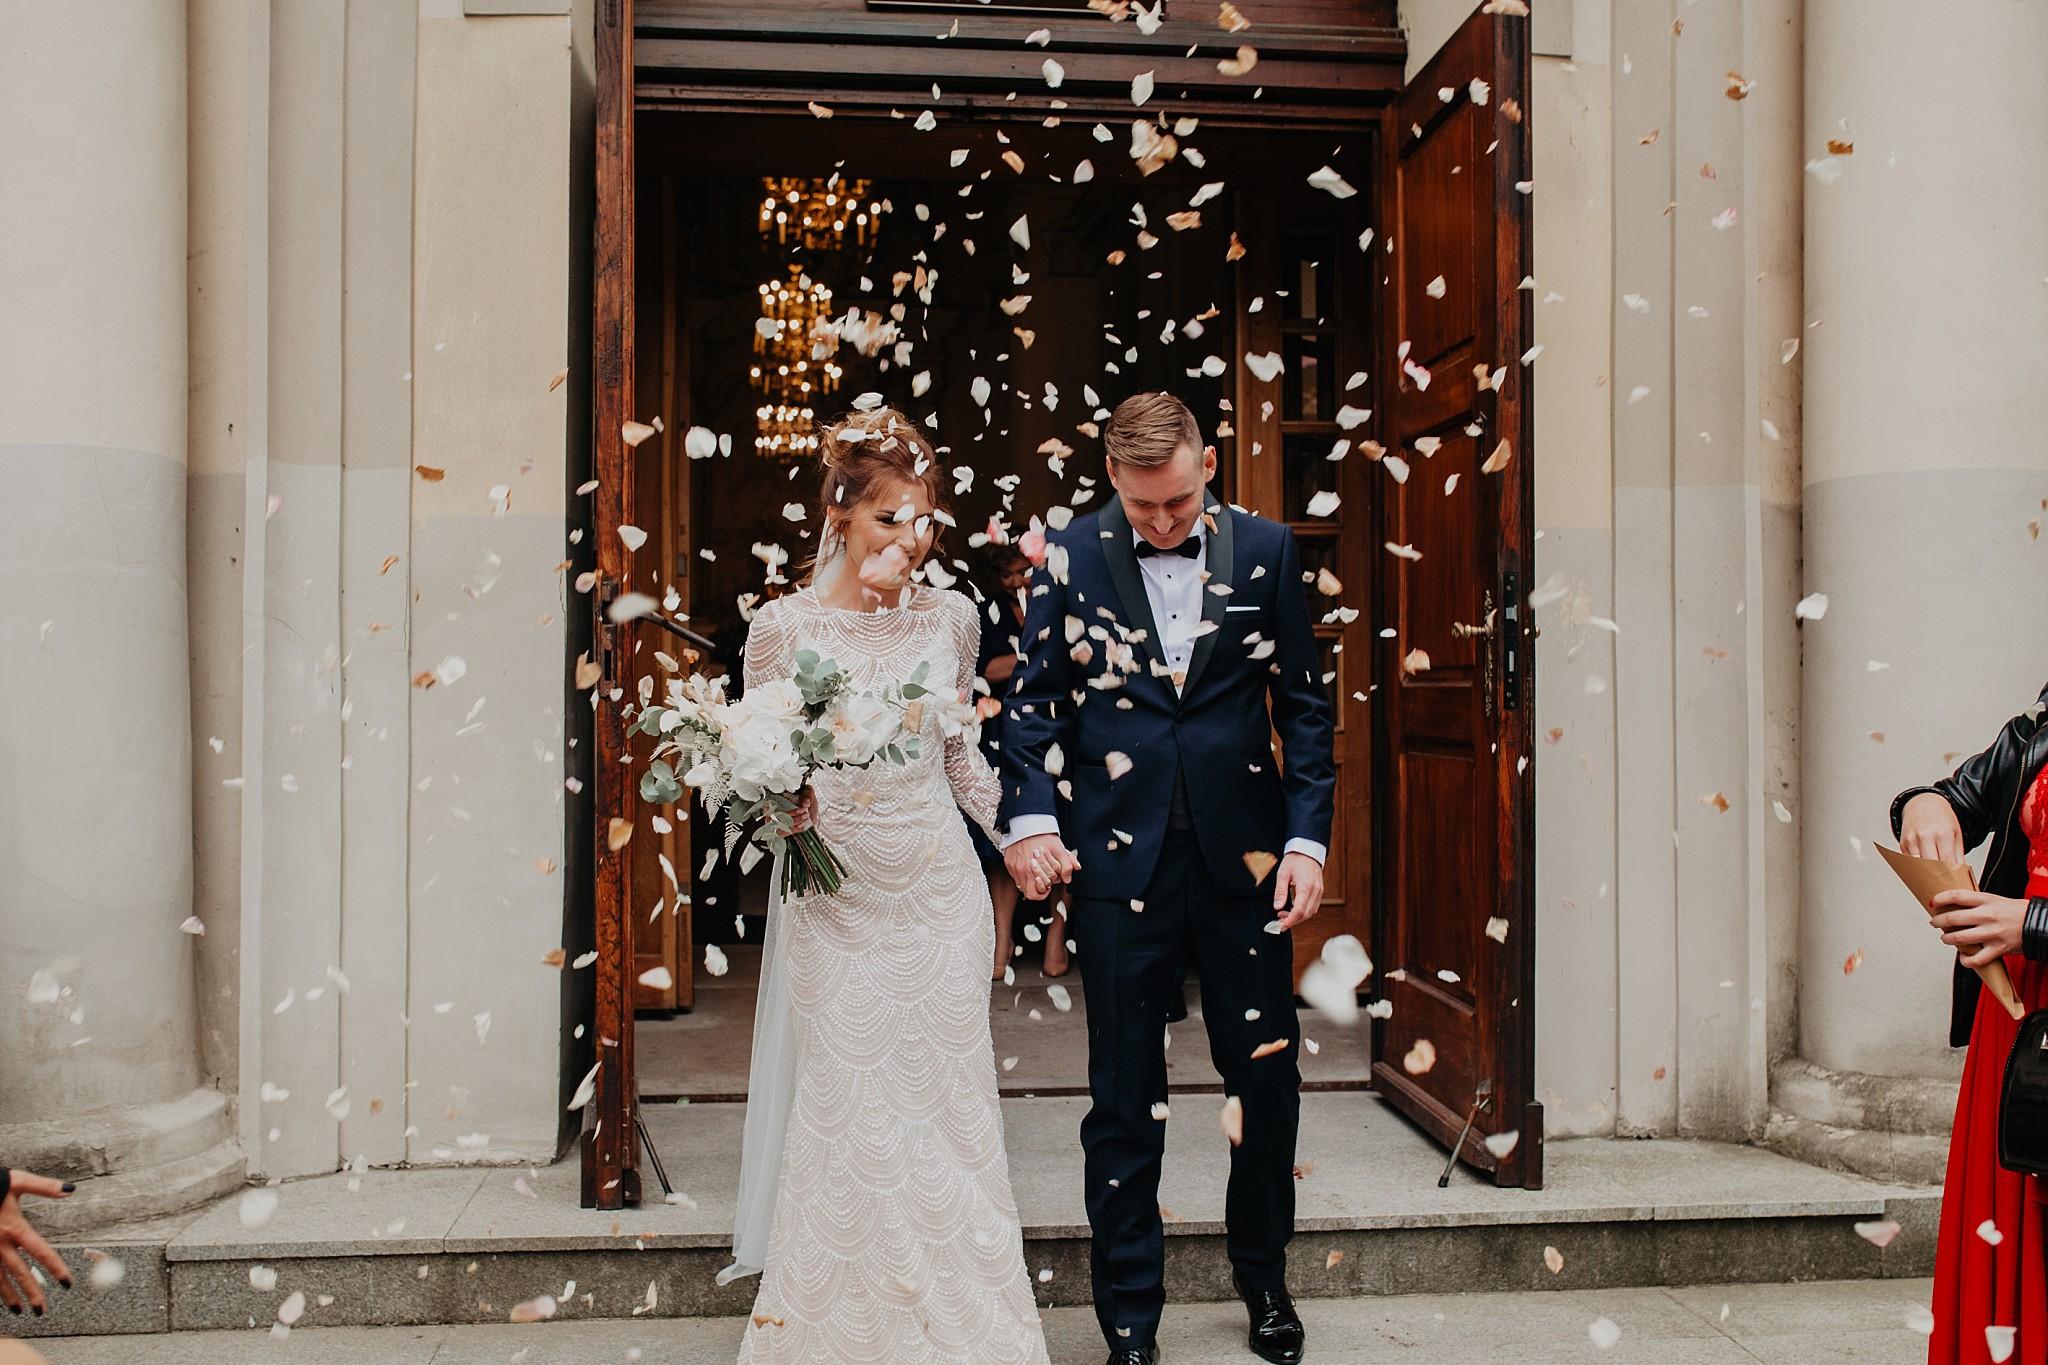 fotograf poznan wesele dobra truskawka piekne wesele pod poznaniem wesele w dobrej truskawce piekna para mloda slub marzen slub koronawirus slub listopad wesele koronawirus 218